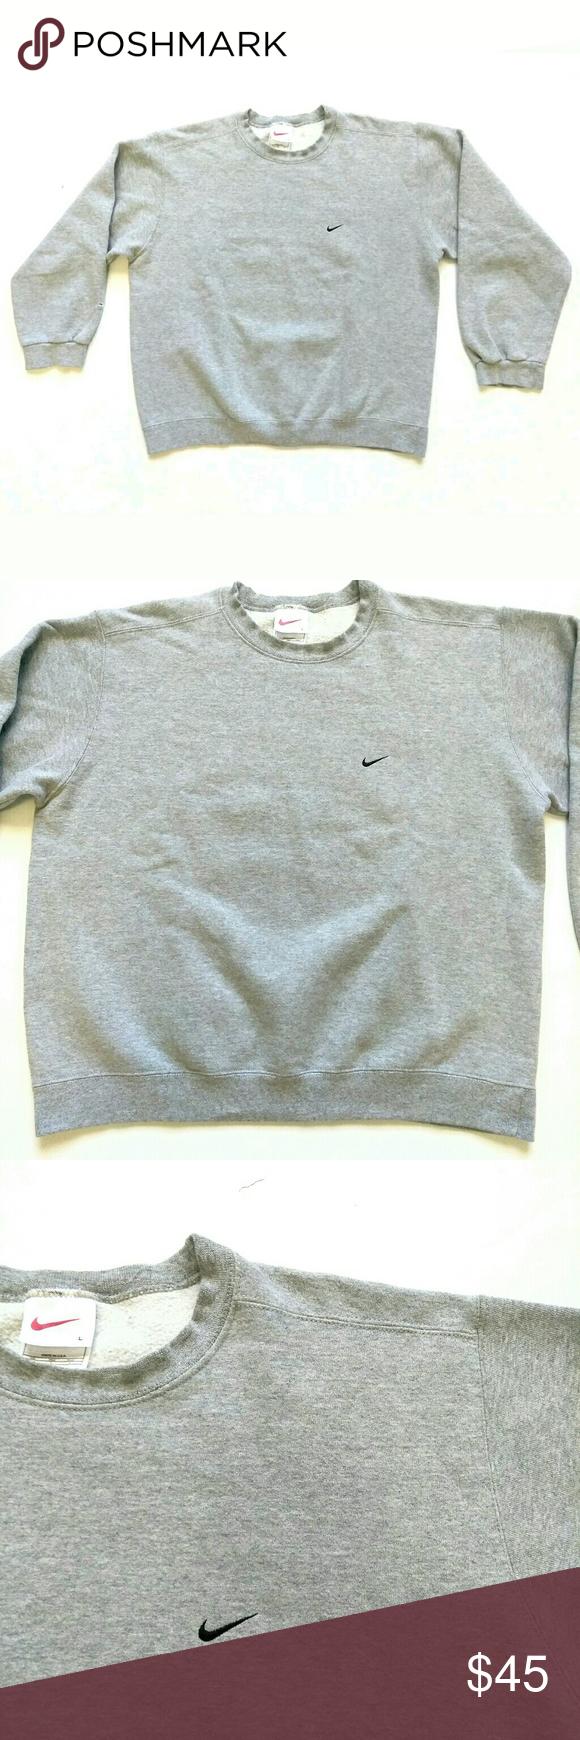 Vintage Nike Crewneck Sweatshirt Large Made In Usa Nike Crewneck Sweatshirt Vintage Nike Pullover Sweater Sweatshirts [ 1740 x 580 Pixel ]